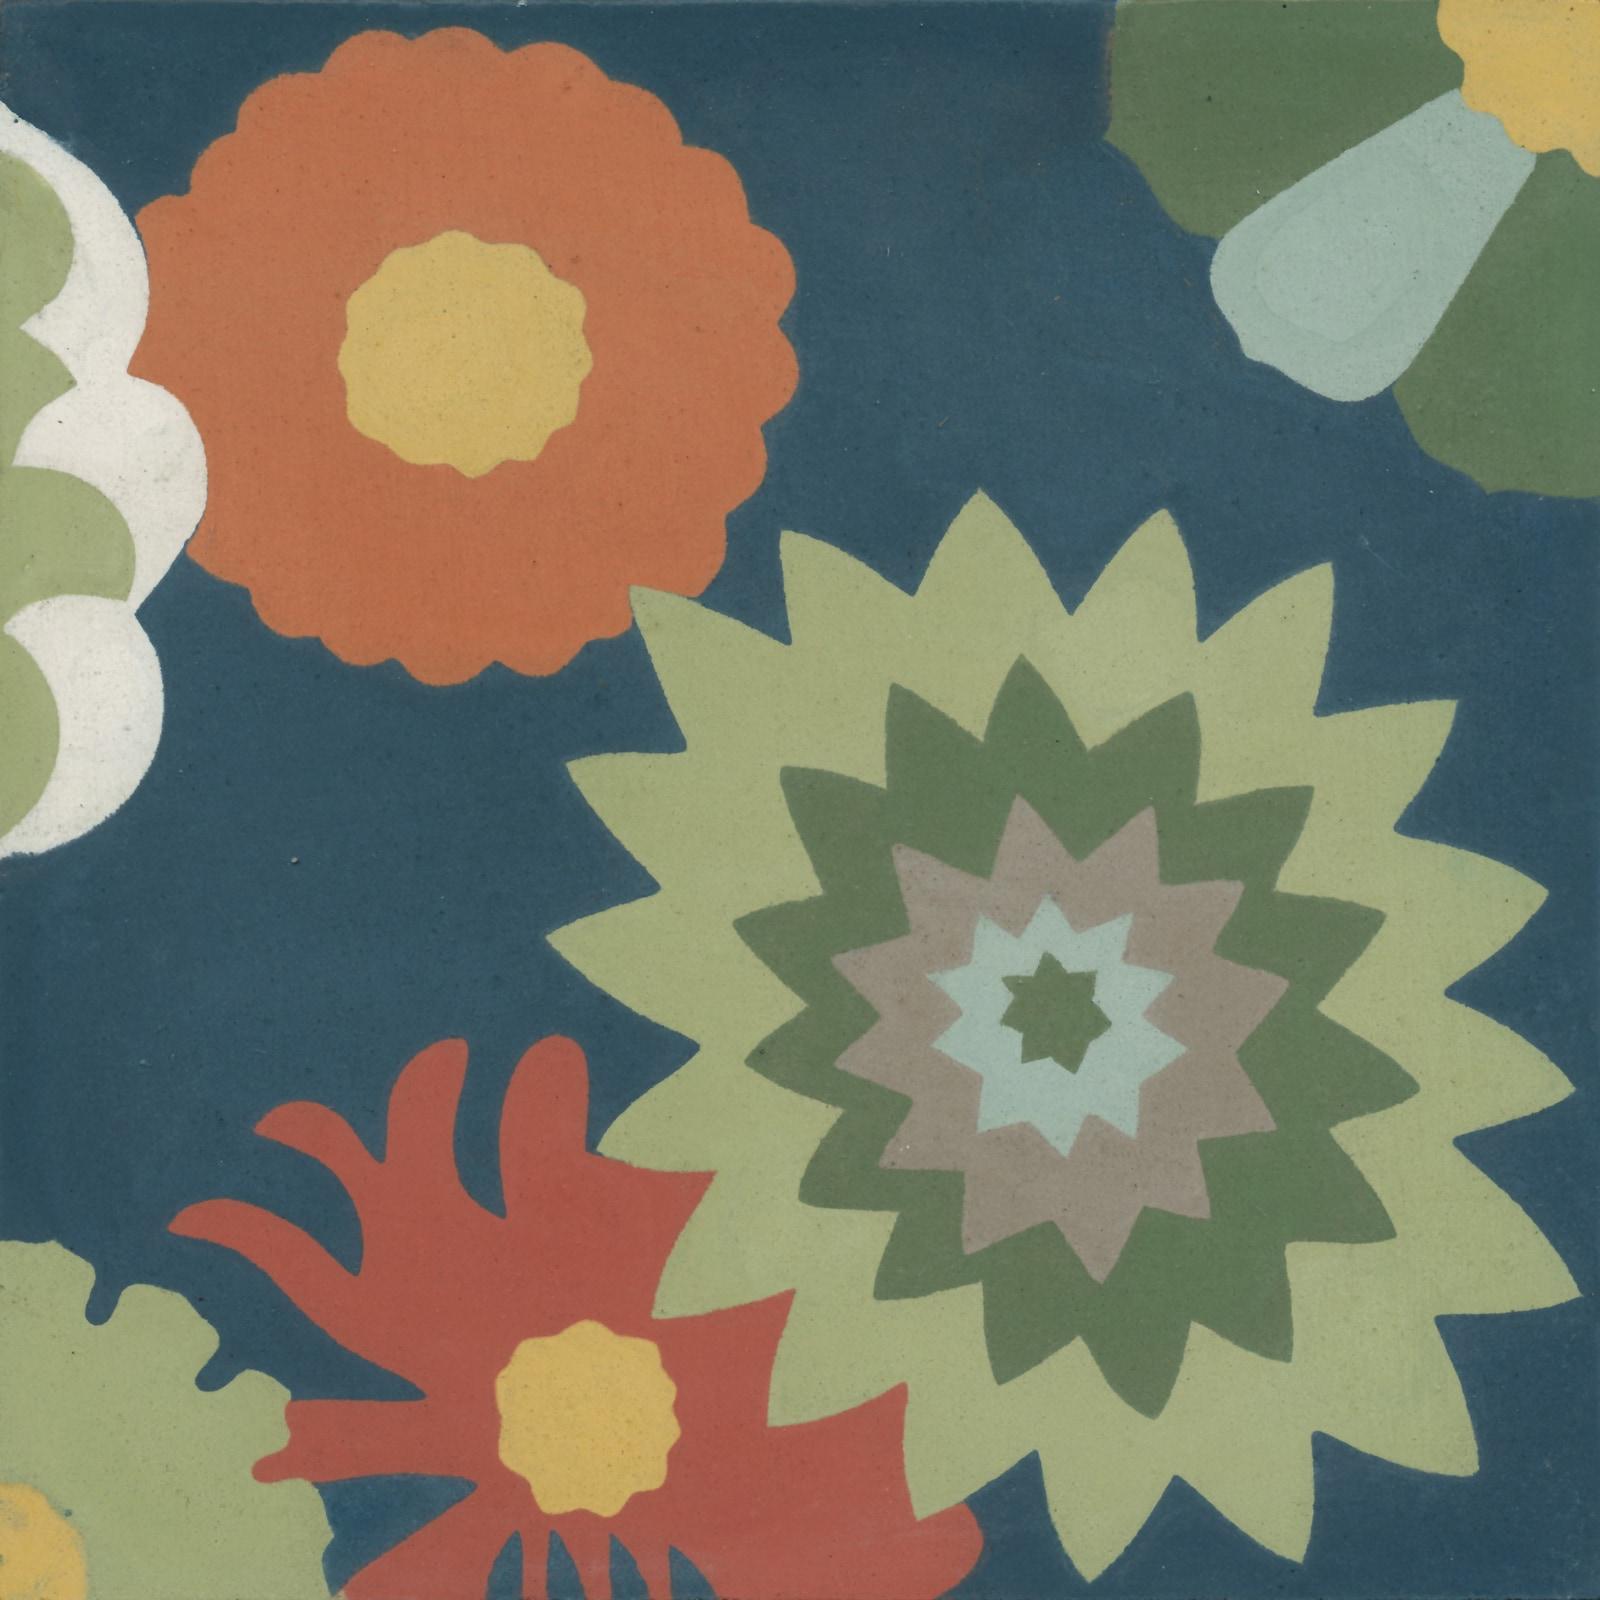 VIA_54078Zementmosaikplatten-VIA-GmbH | 51078